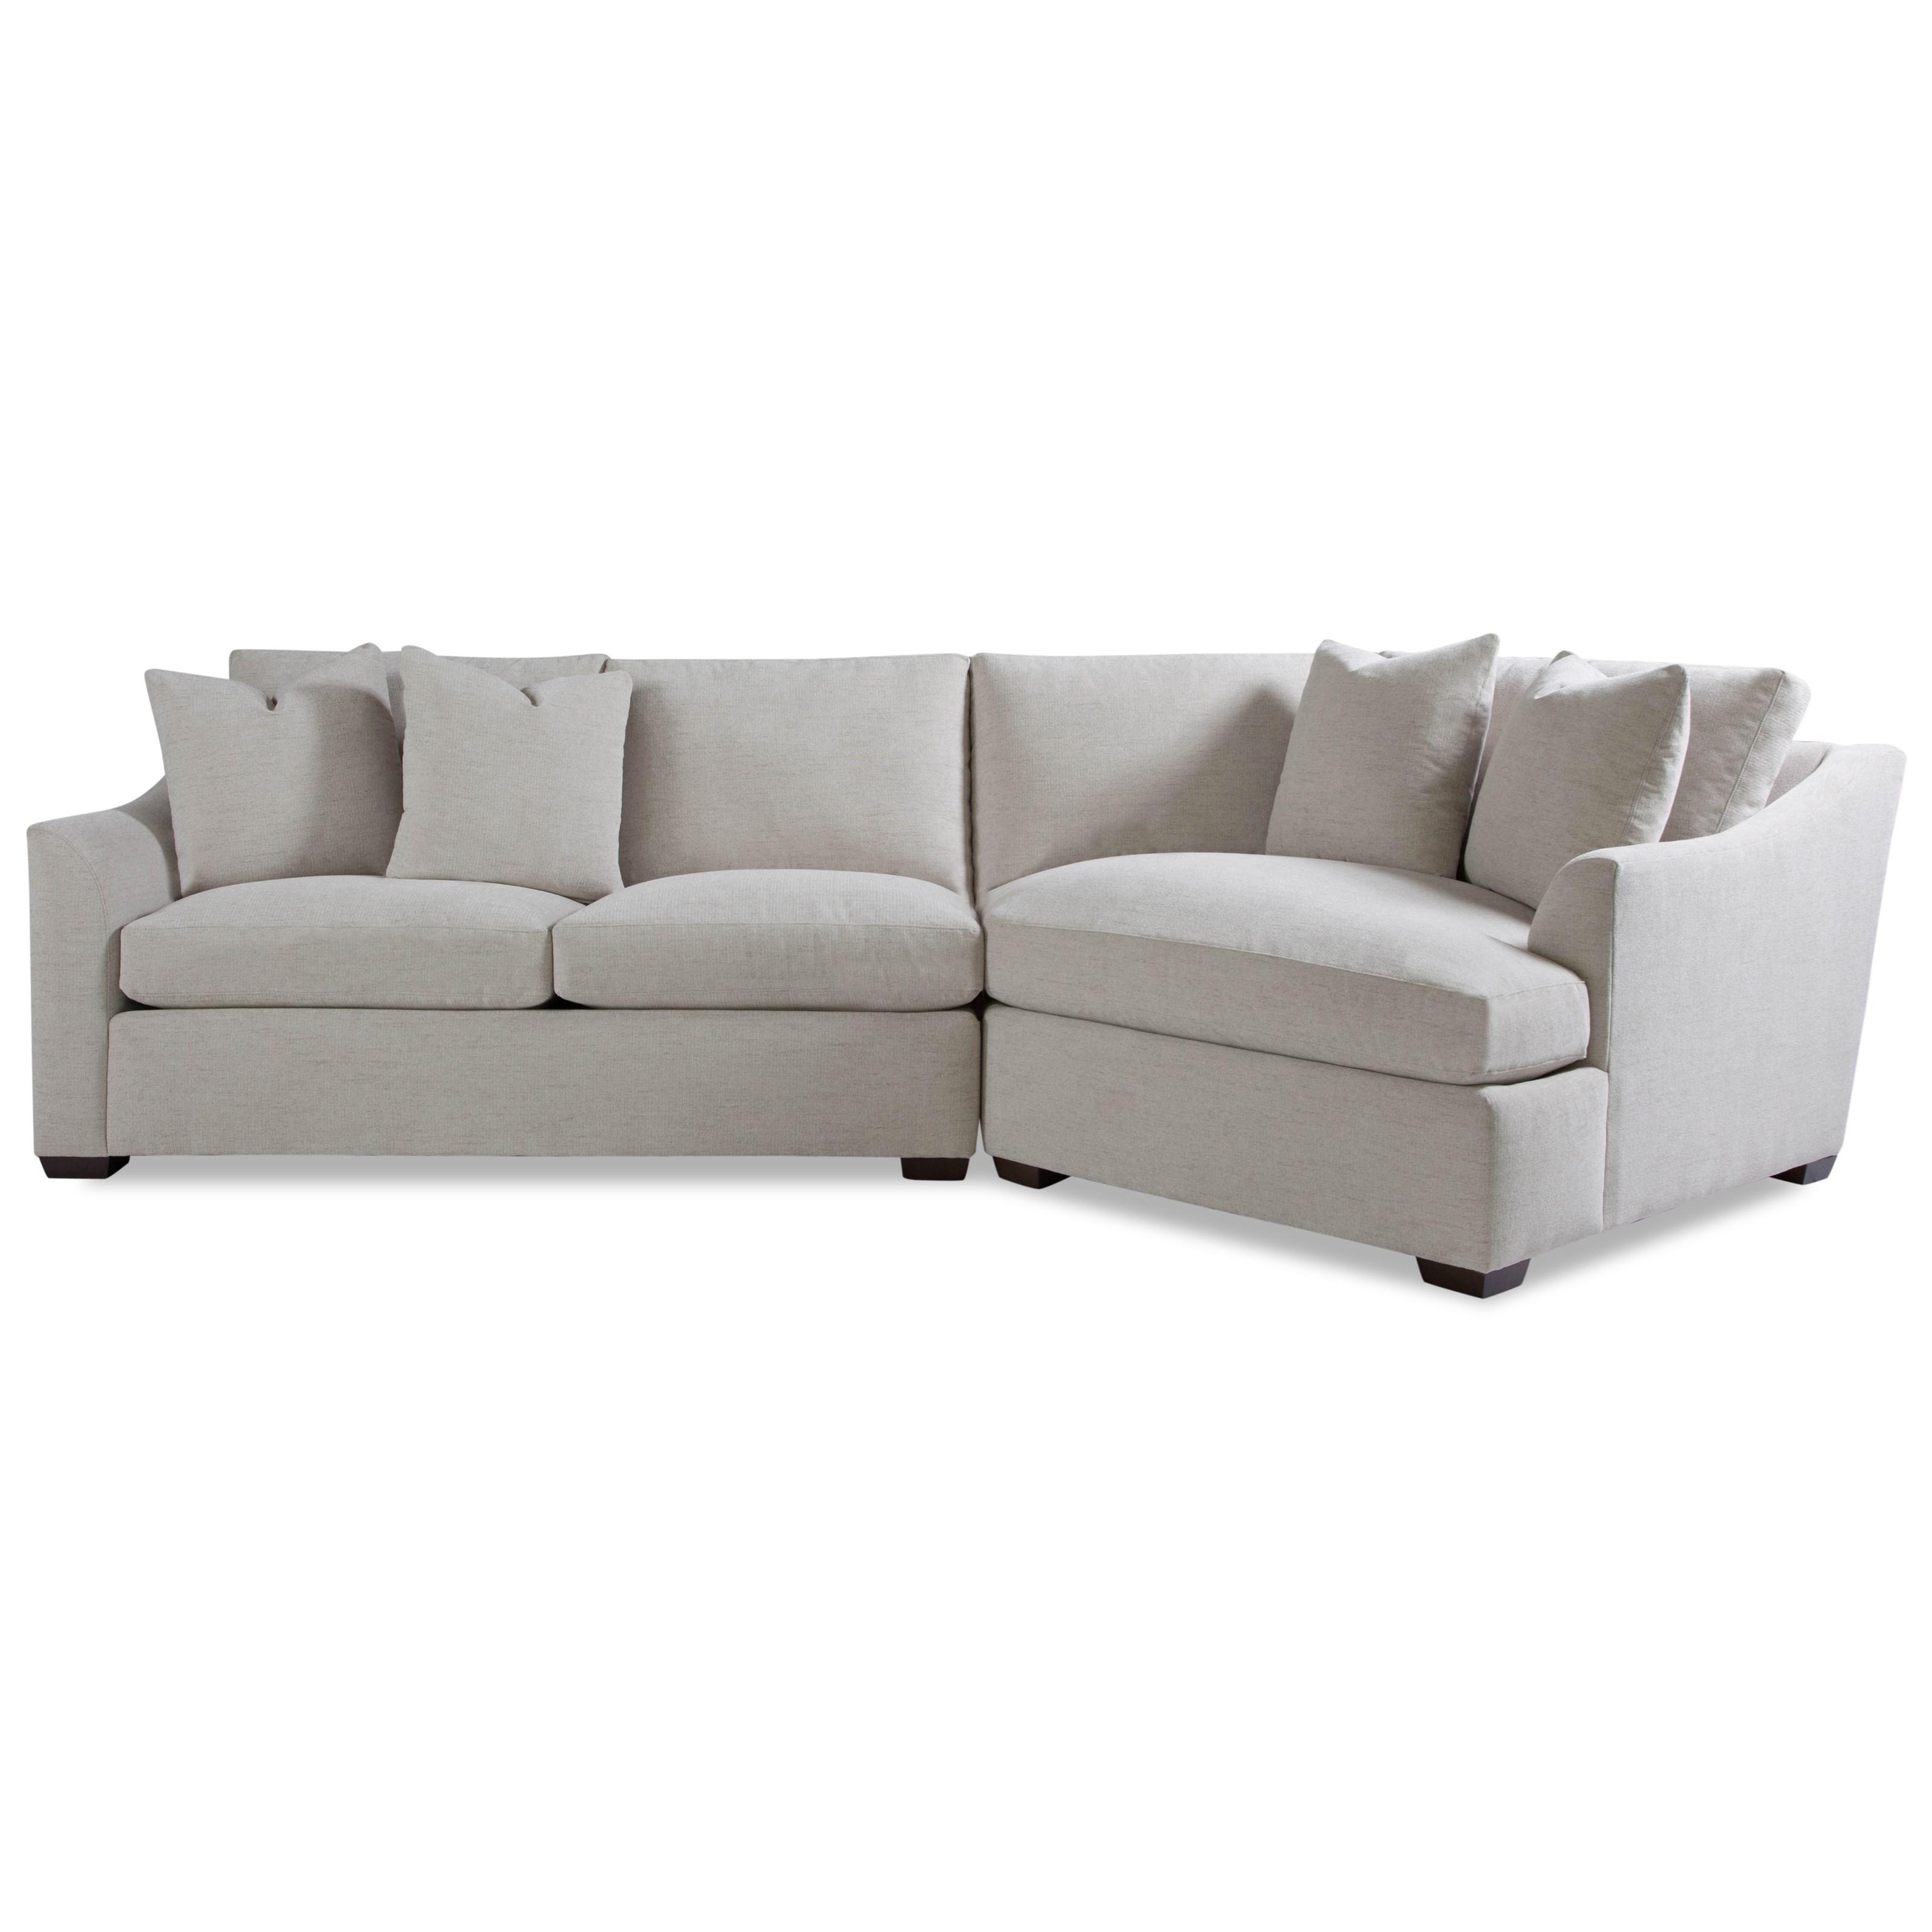 Huntington House Plush2 Pc Sectional Sofa W/ Flare Arms ...